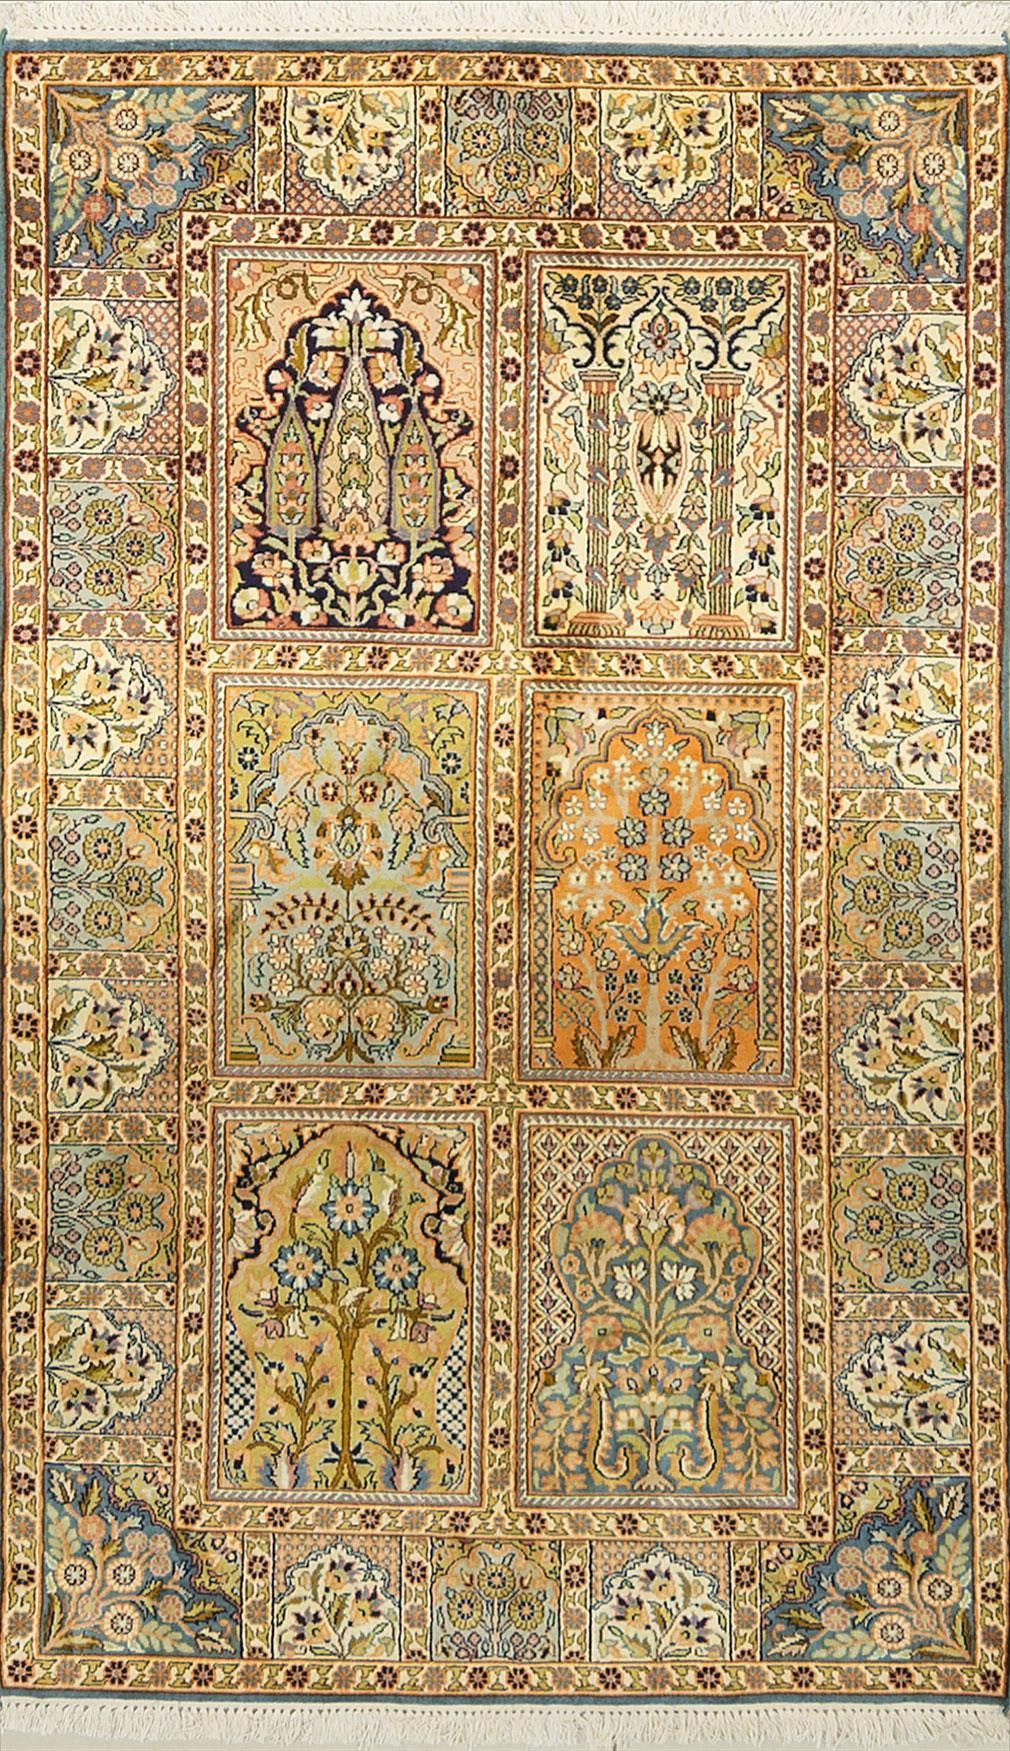 A Hand Knotted Silk Keshmiri Rug, 151 x 91